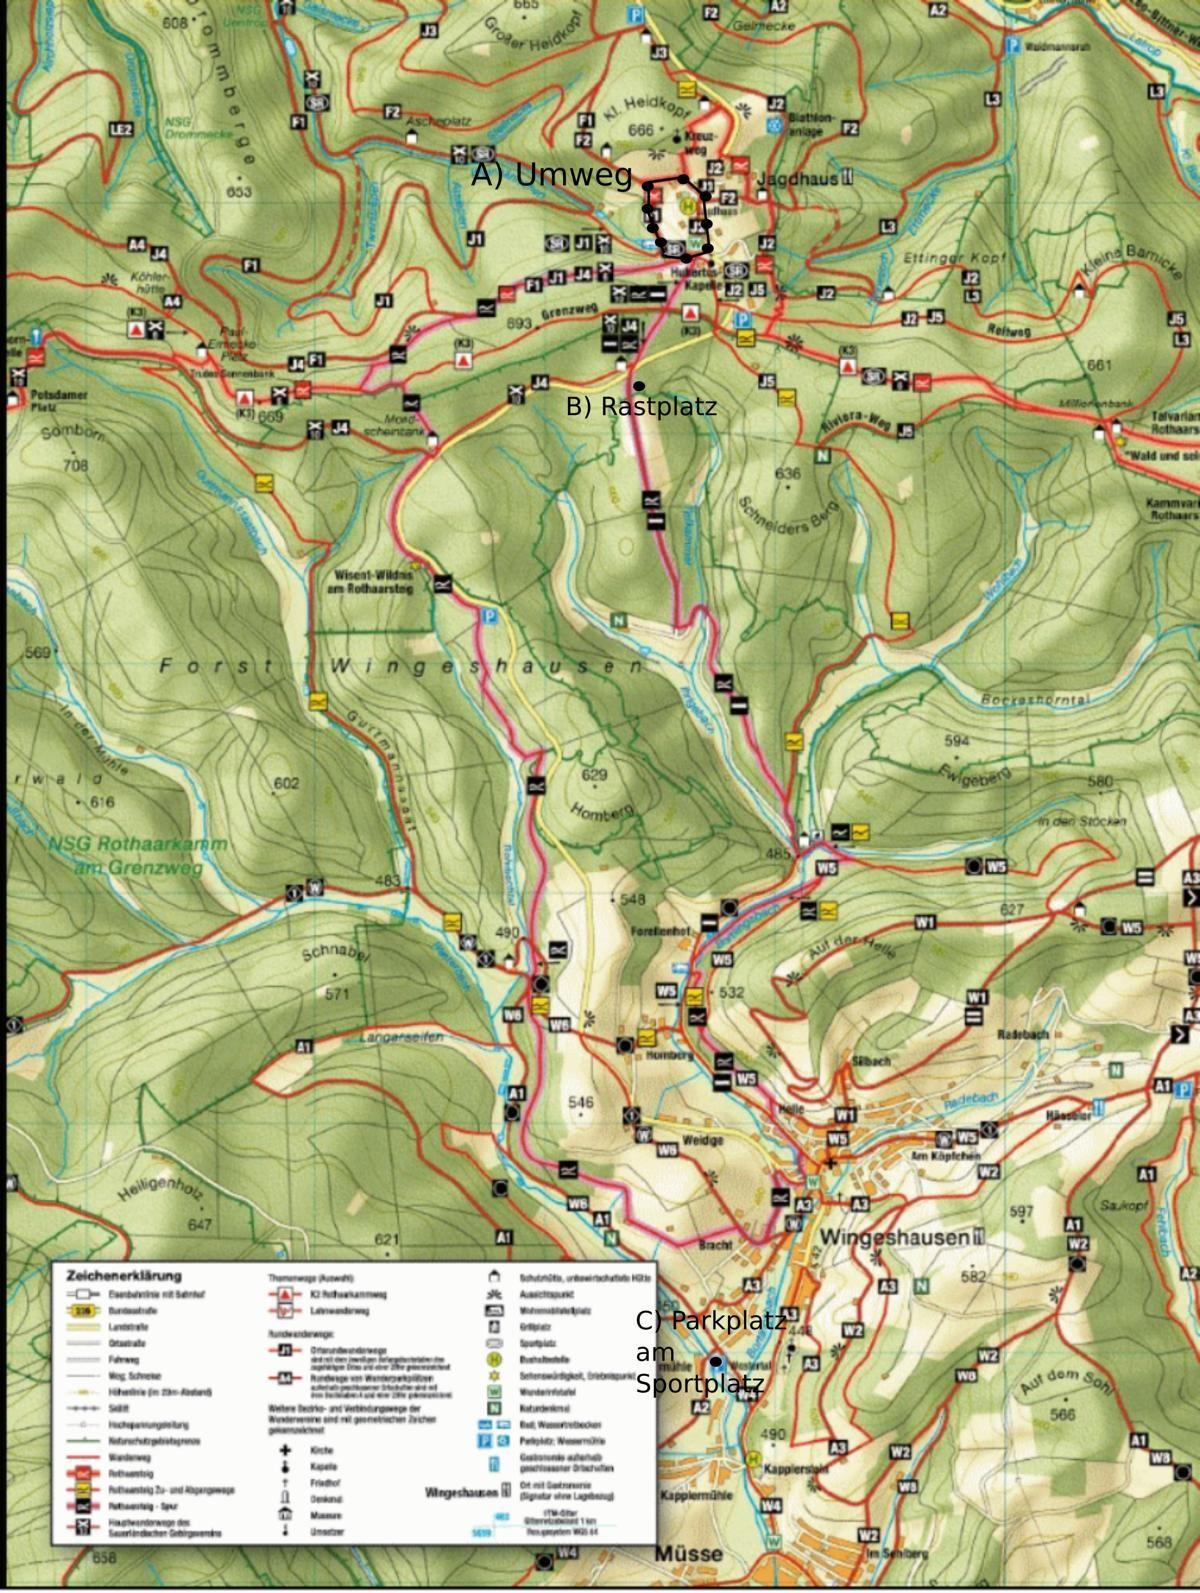 Rothaarsteig Karte.Wisentpfad Rothaarsteig Wandern Tagestouren Produkttipps